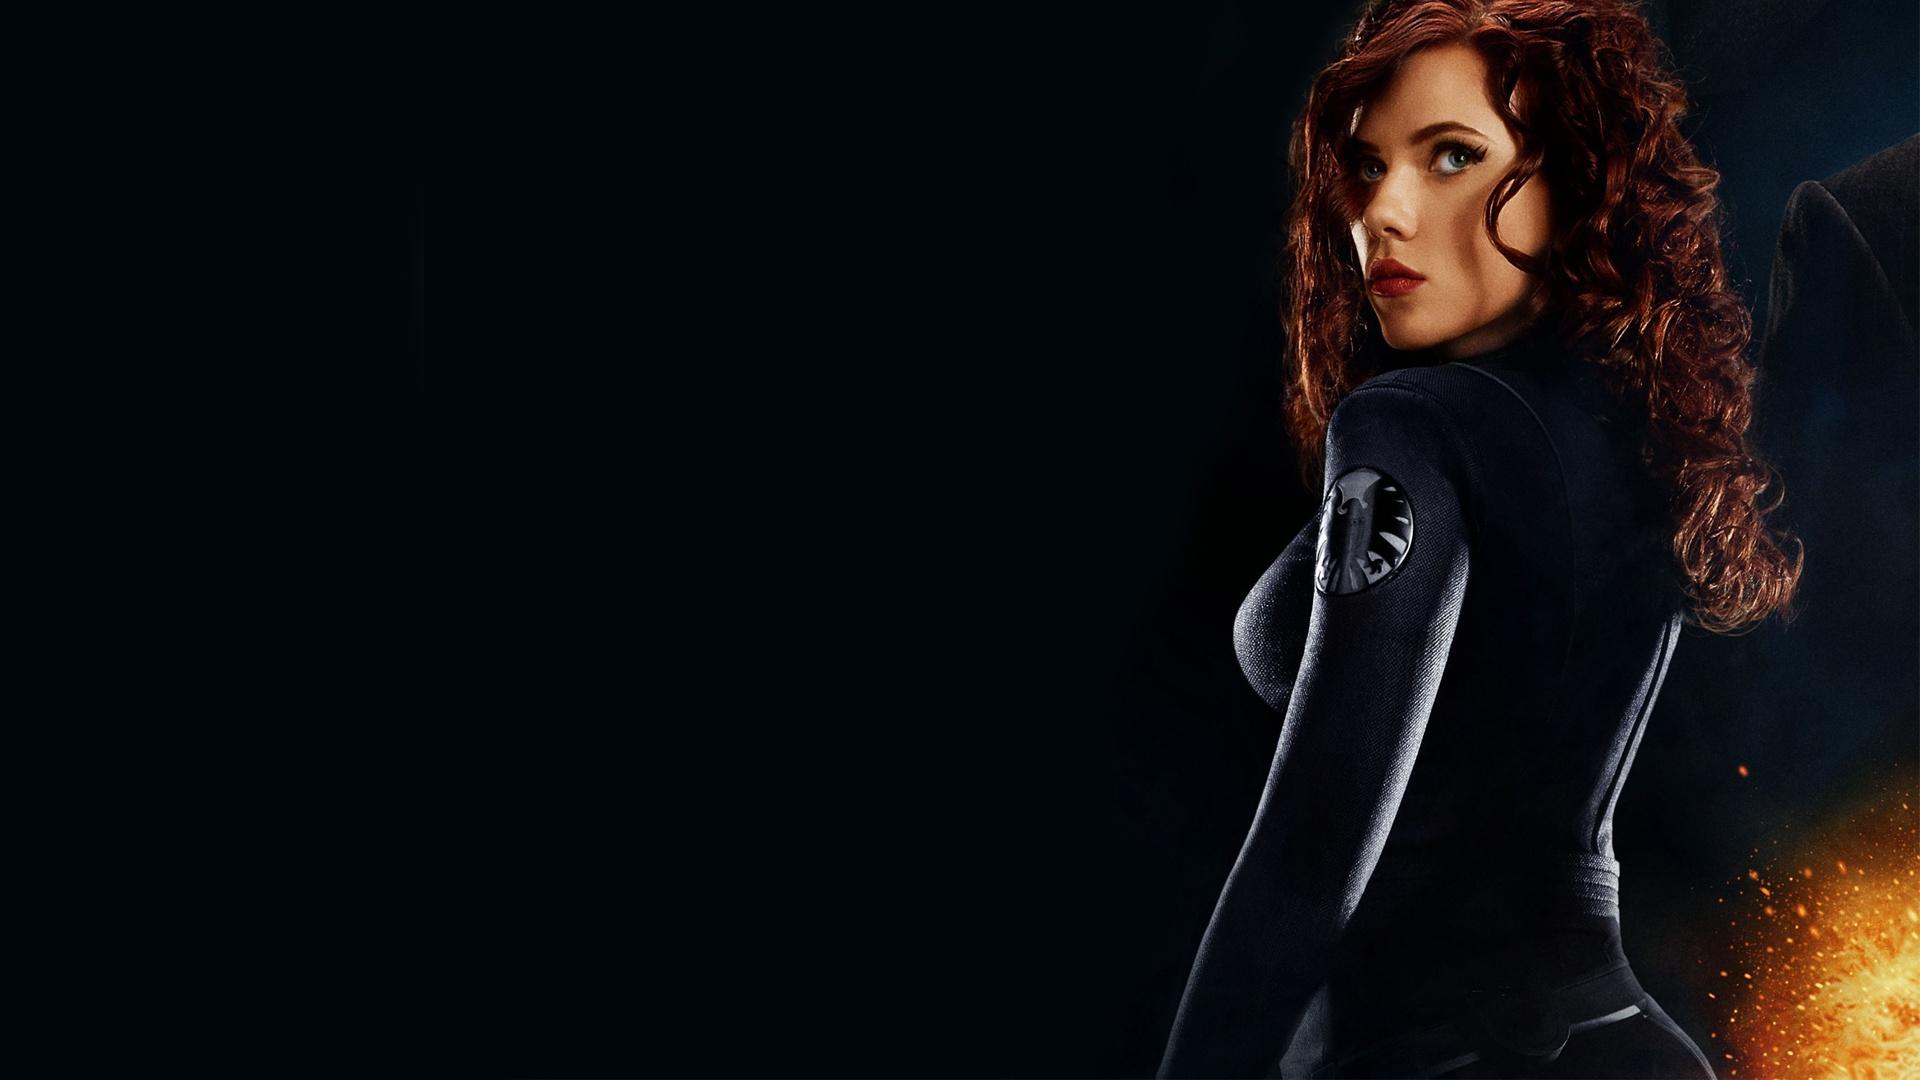 Johansson as Black Widow in Iron Man 2 Wallpapers HD Wallpapers 1920x1080